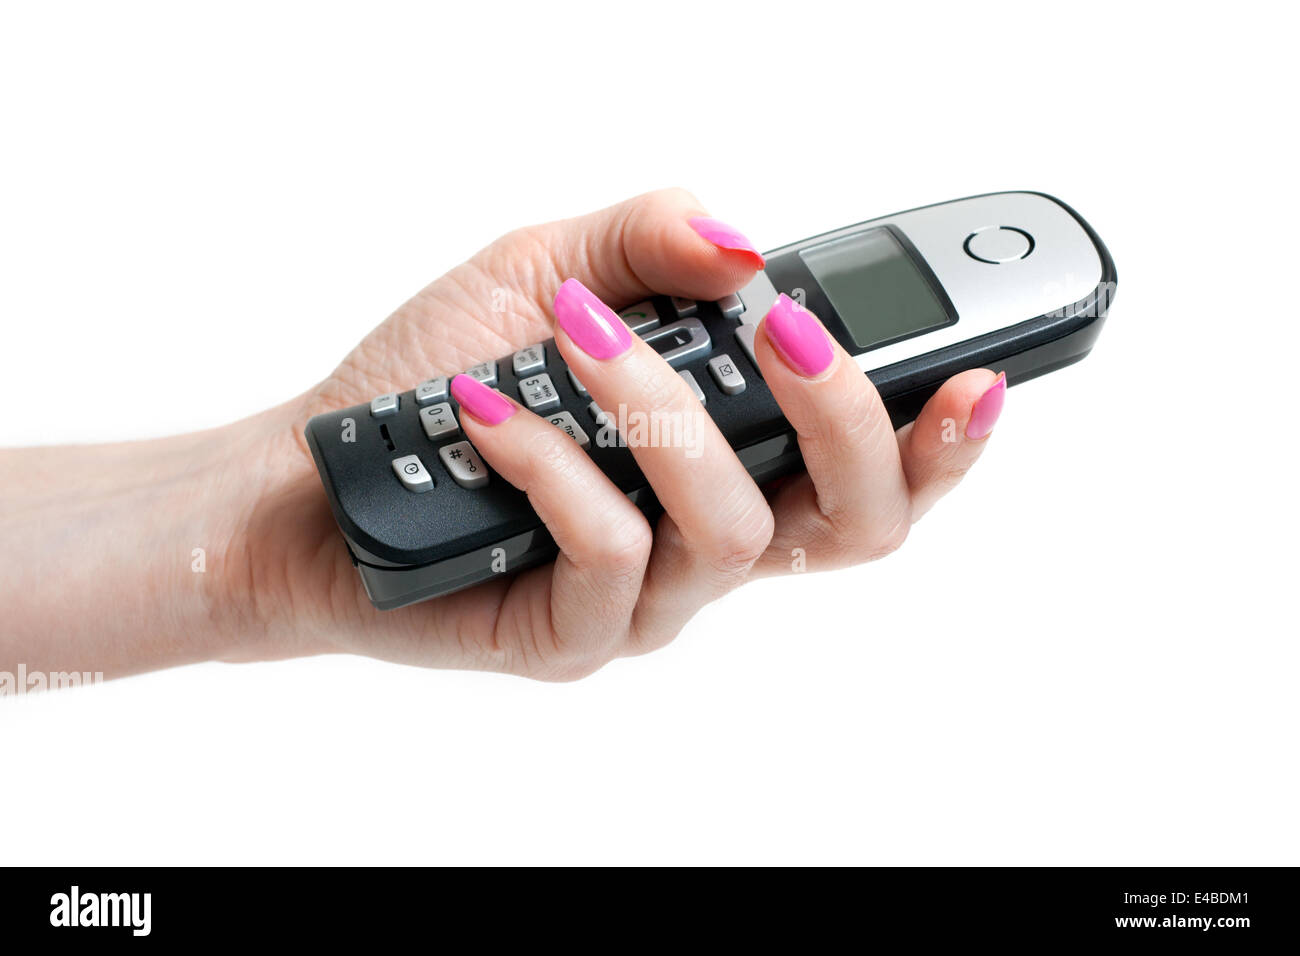 Feminine hand with telephon - Stock Image